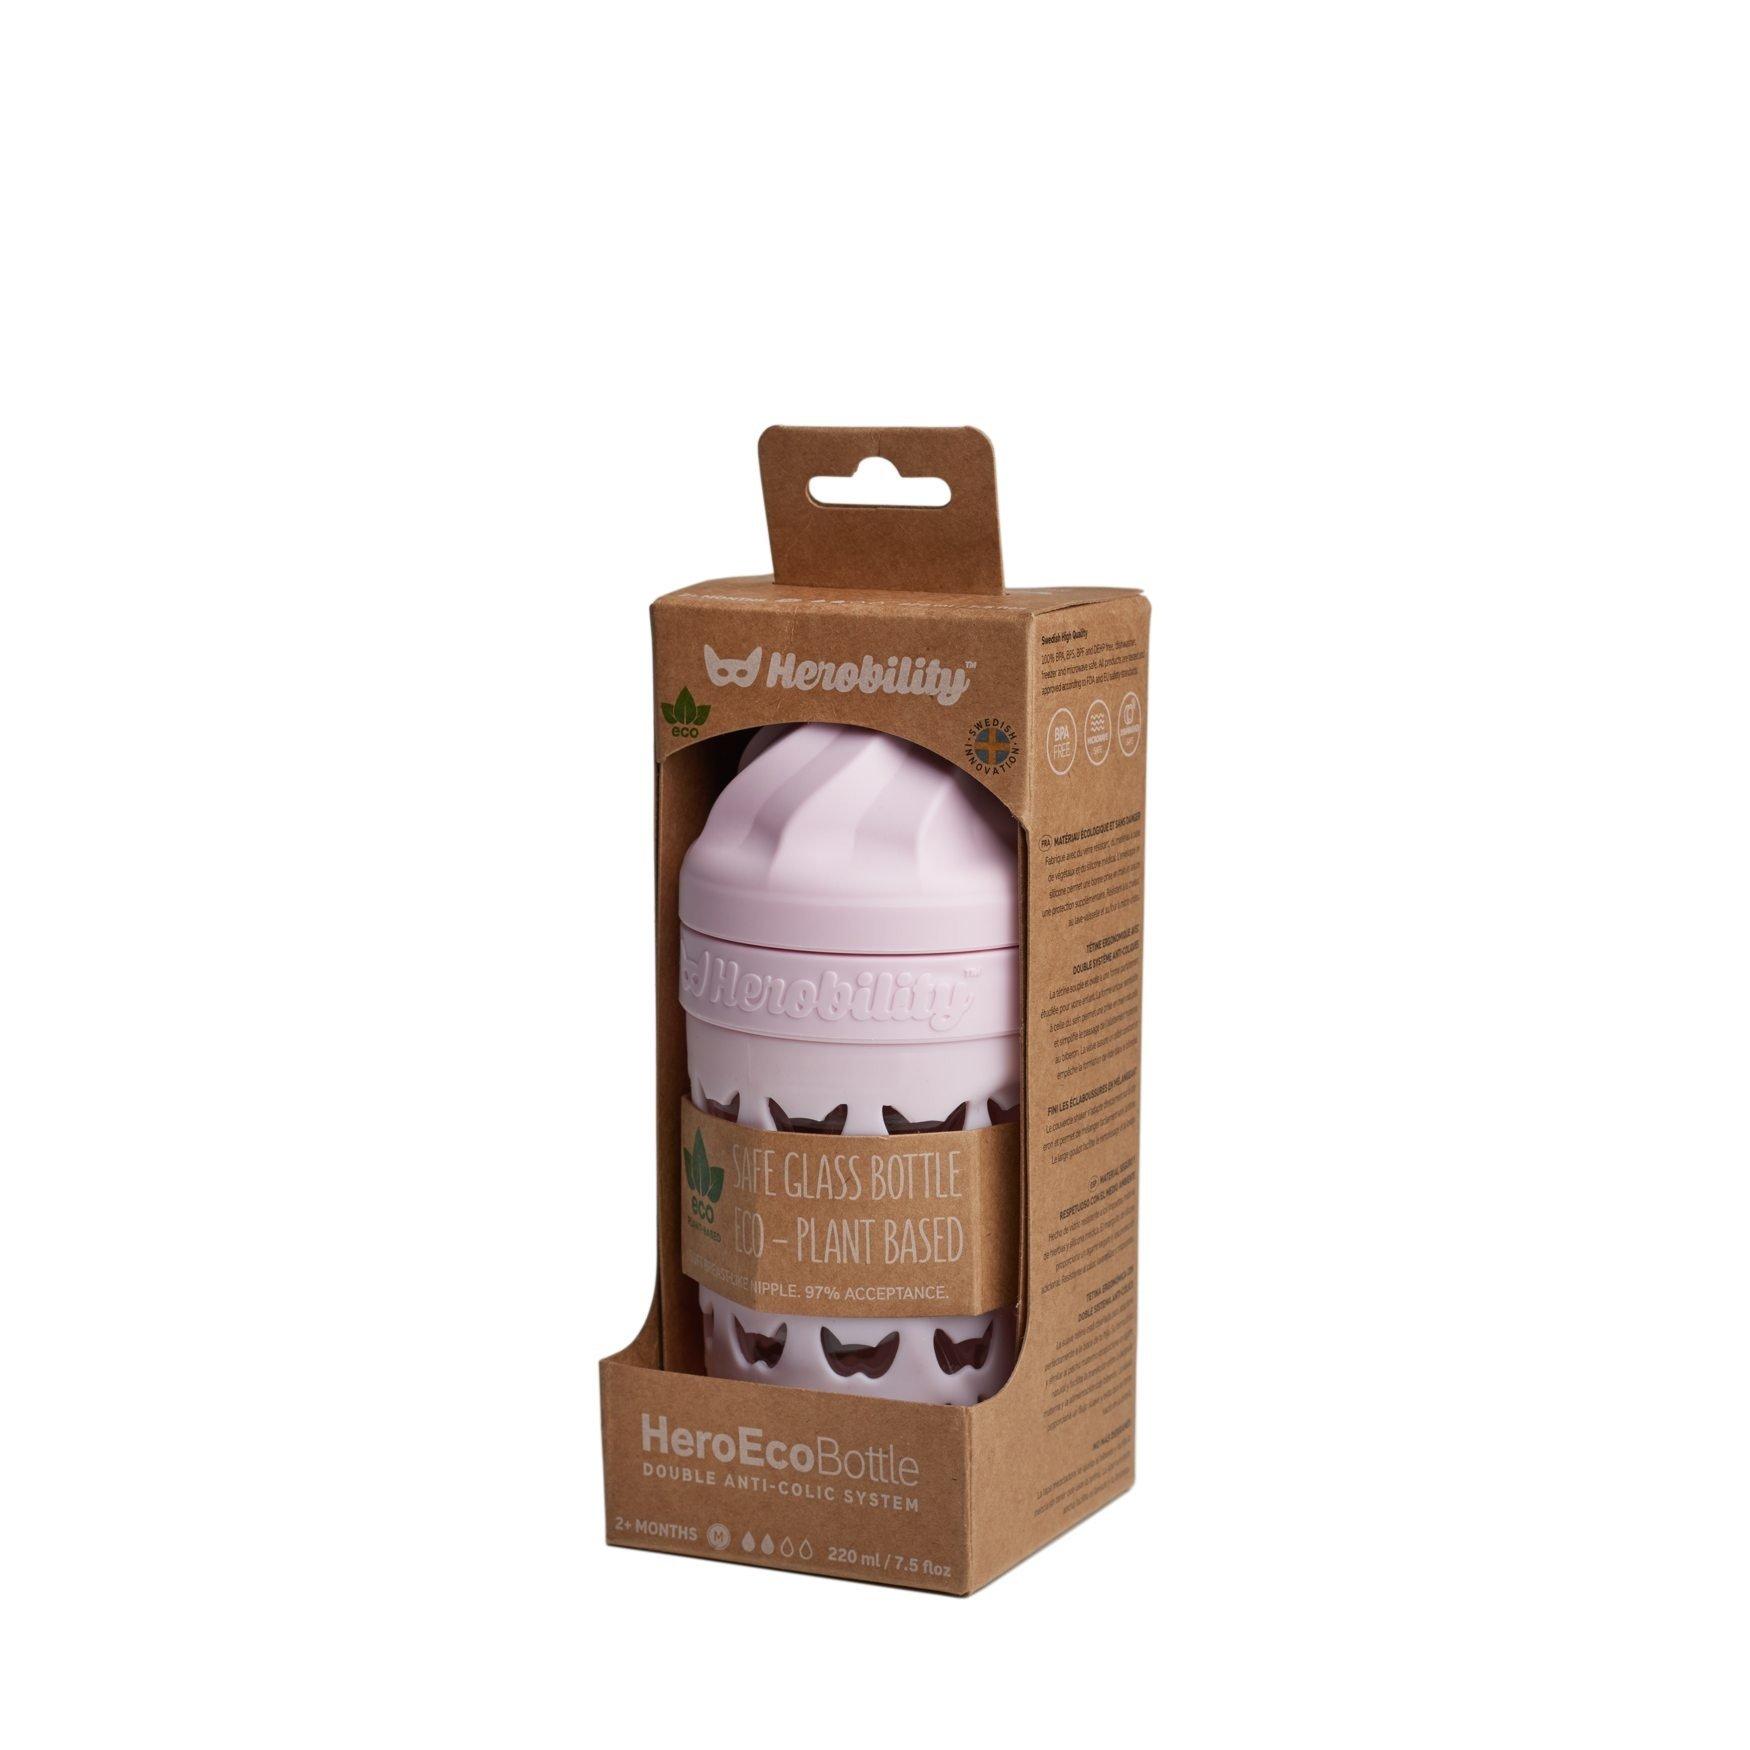 Herobility - butelka antykolkowa HeroEcoBottle - różowa, 220 ml